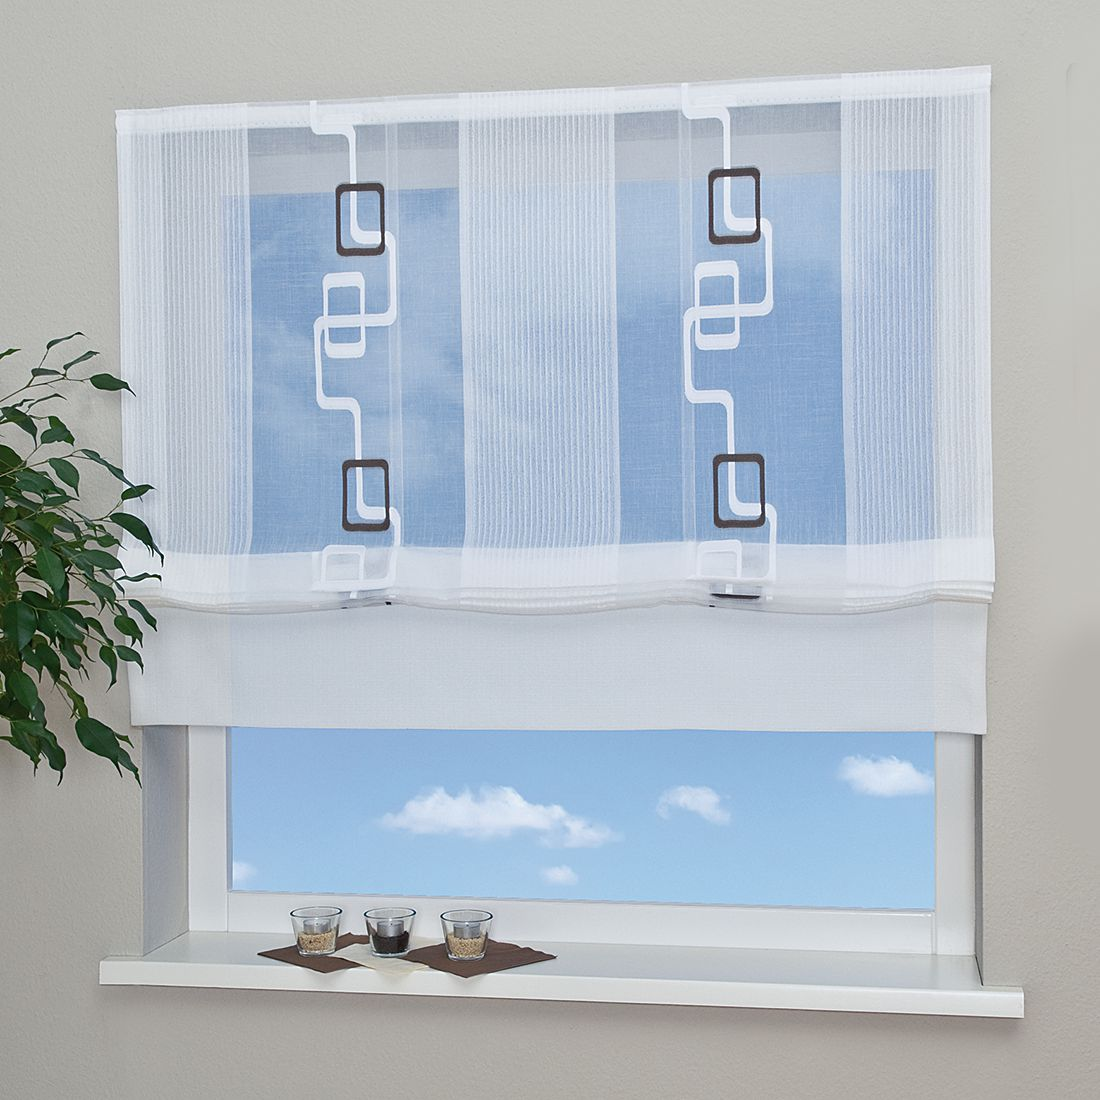 Raffrollo Tanja – 70 x 160 cm, Home24Deko online bestellen